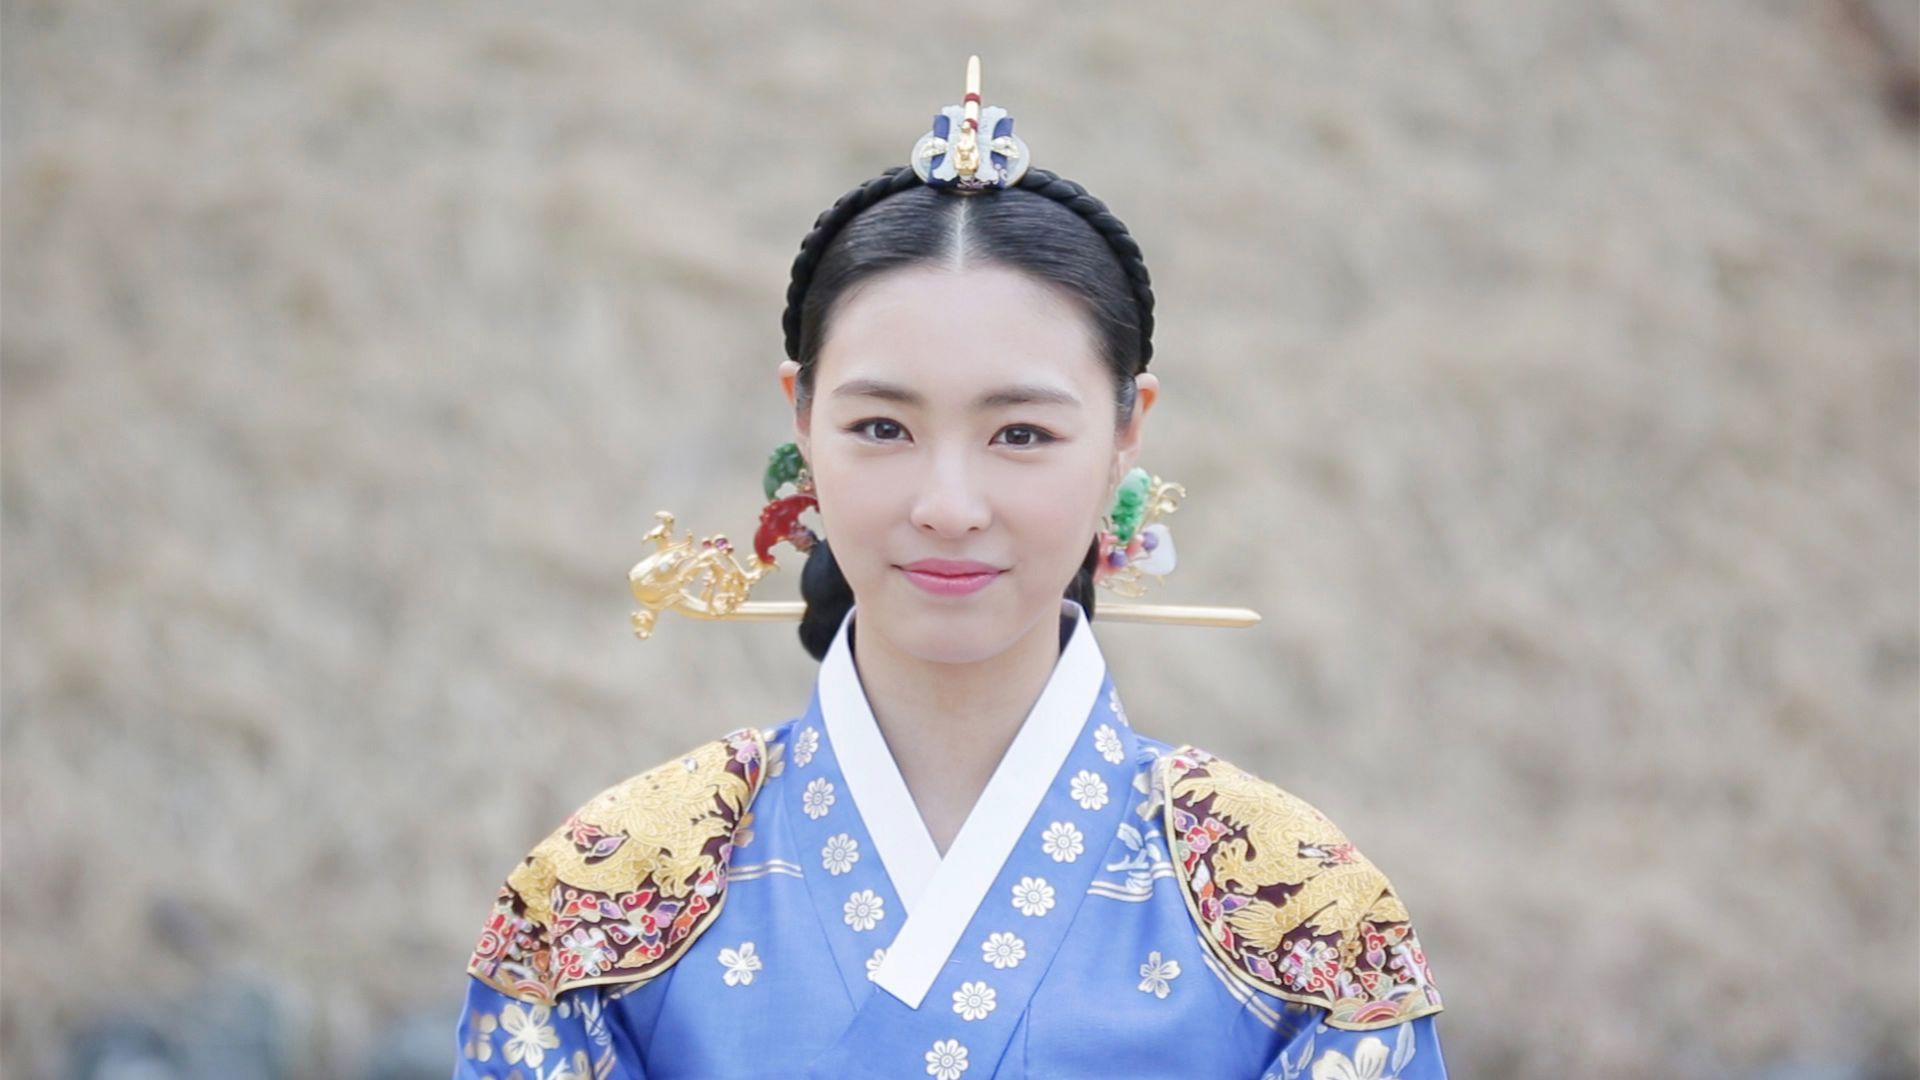 korea joseon dynasty royal princess | traditional asian hairstyles